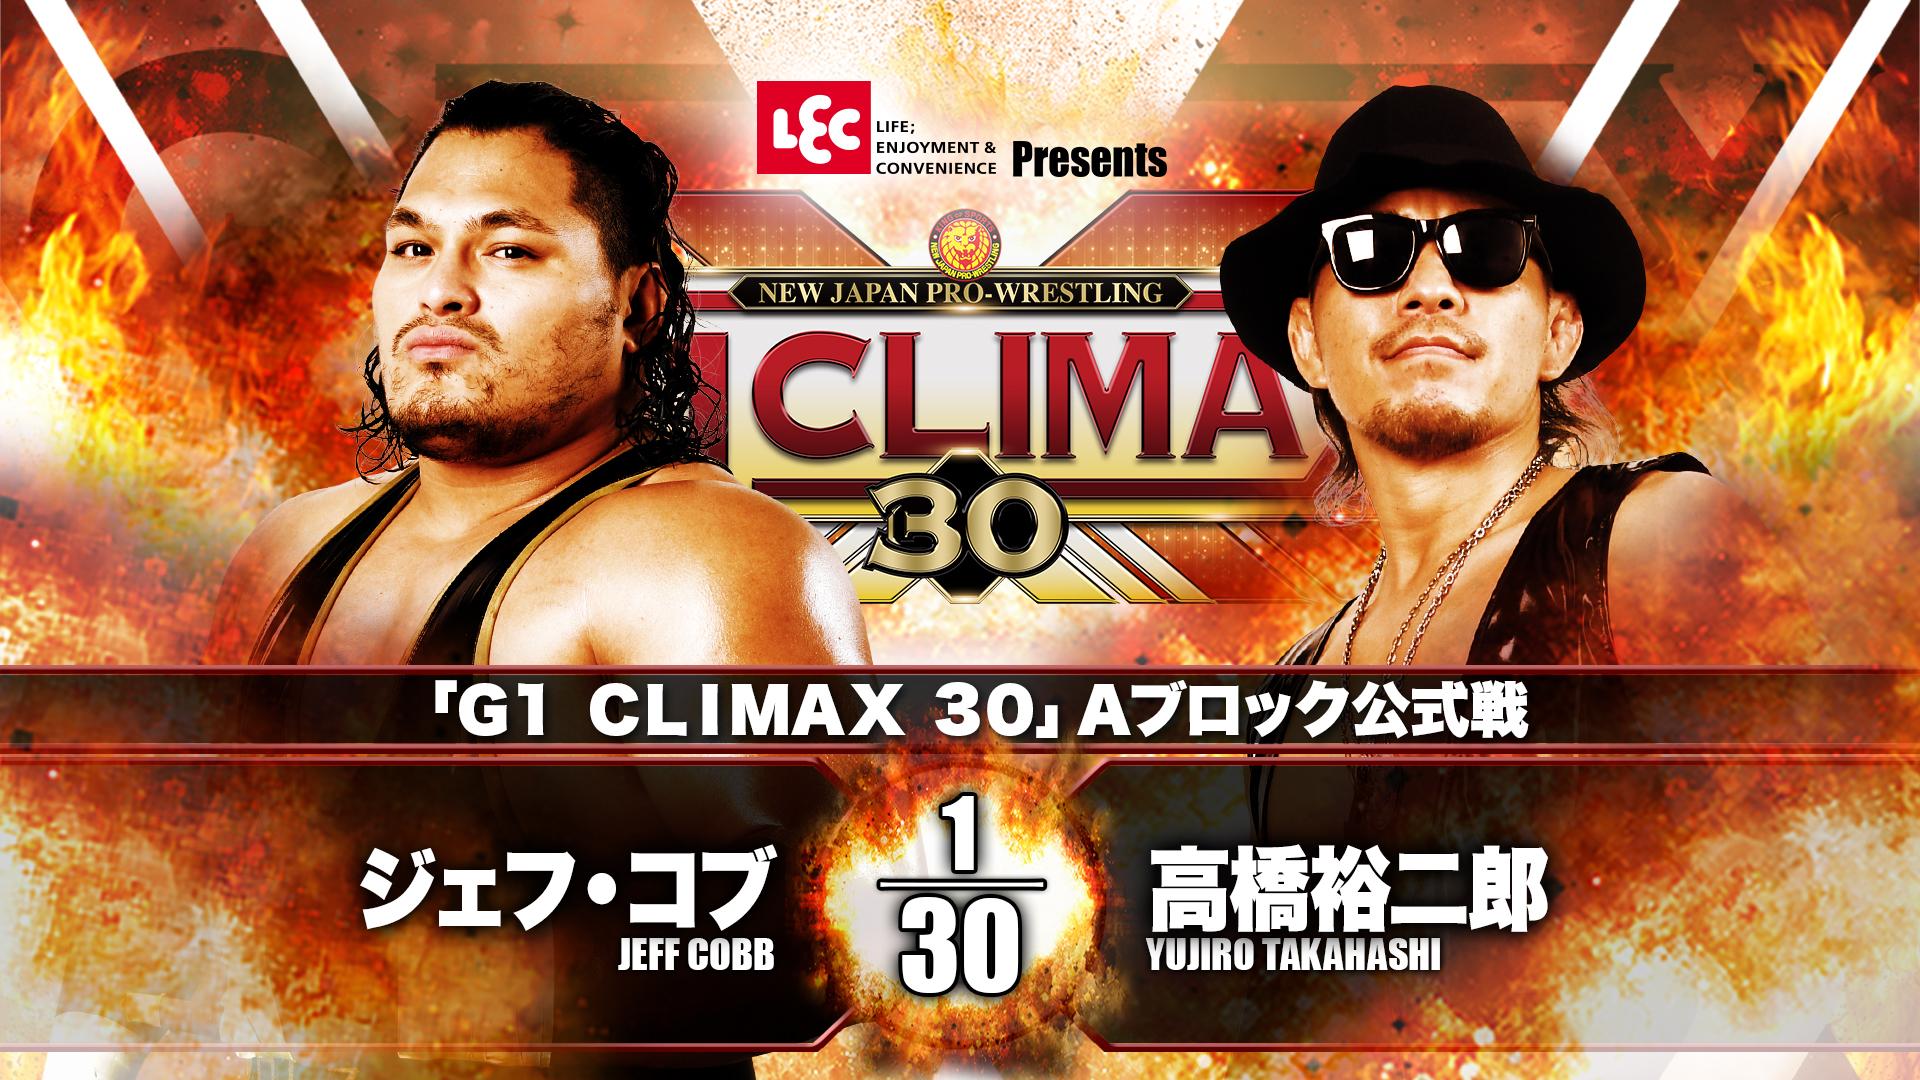 G1 Climax Cobb vs Takahashi